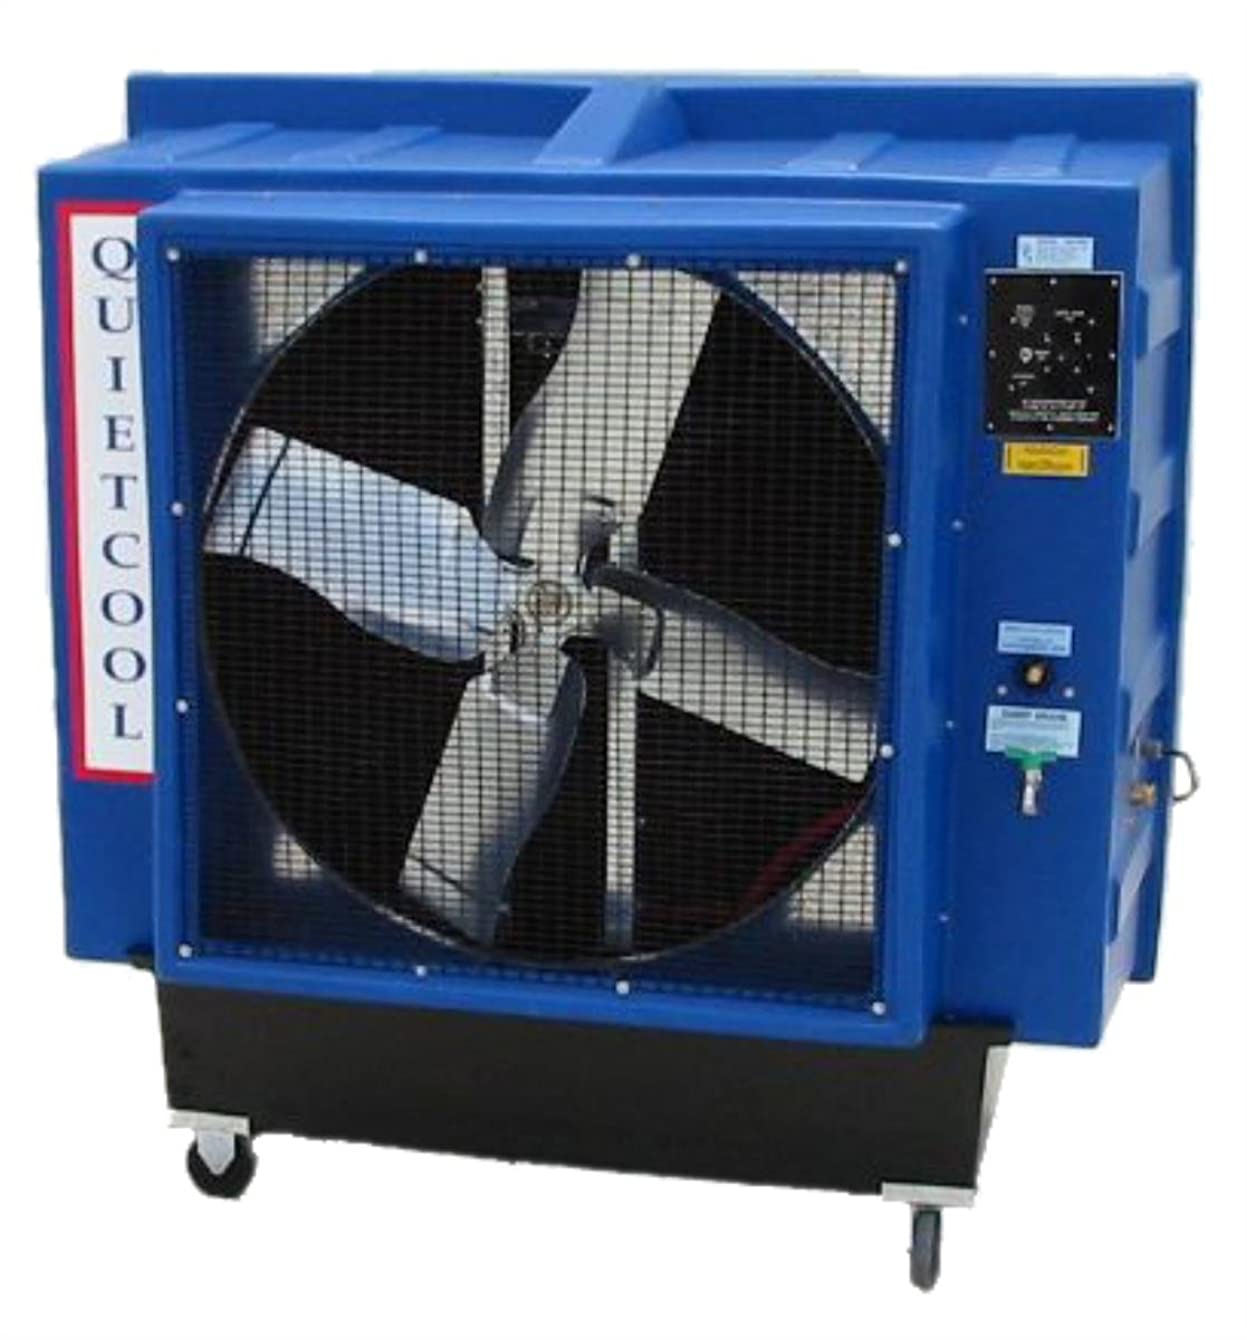 Quietaire QC36B3 36 Inch Belt Drive Portable Evaporative Cooler